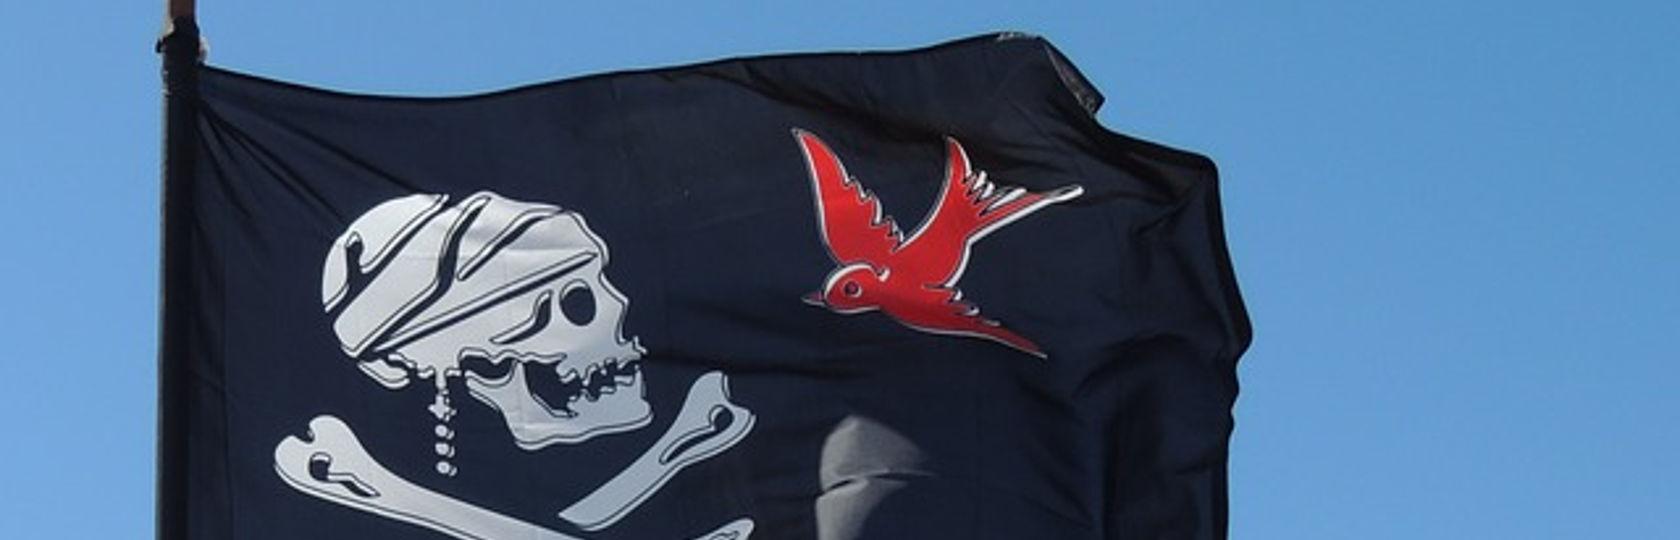 Arrr Paul Mccartney Ist Pirat